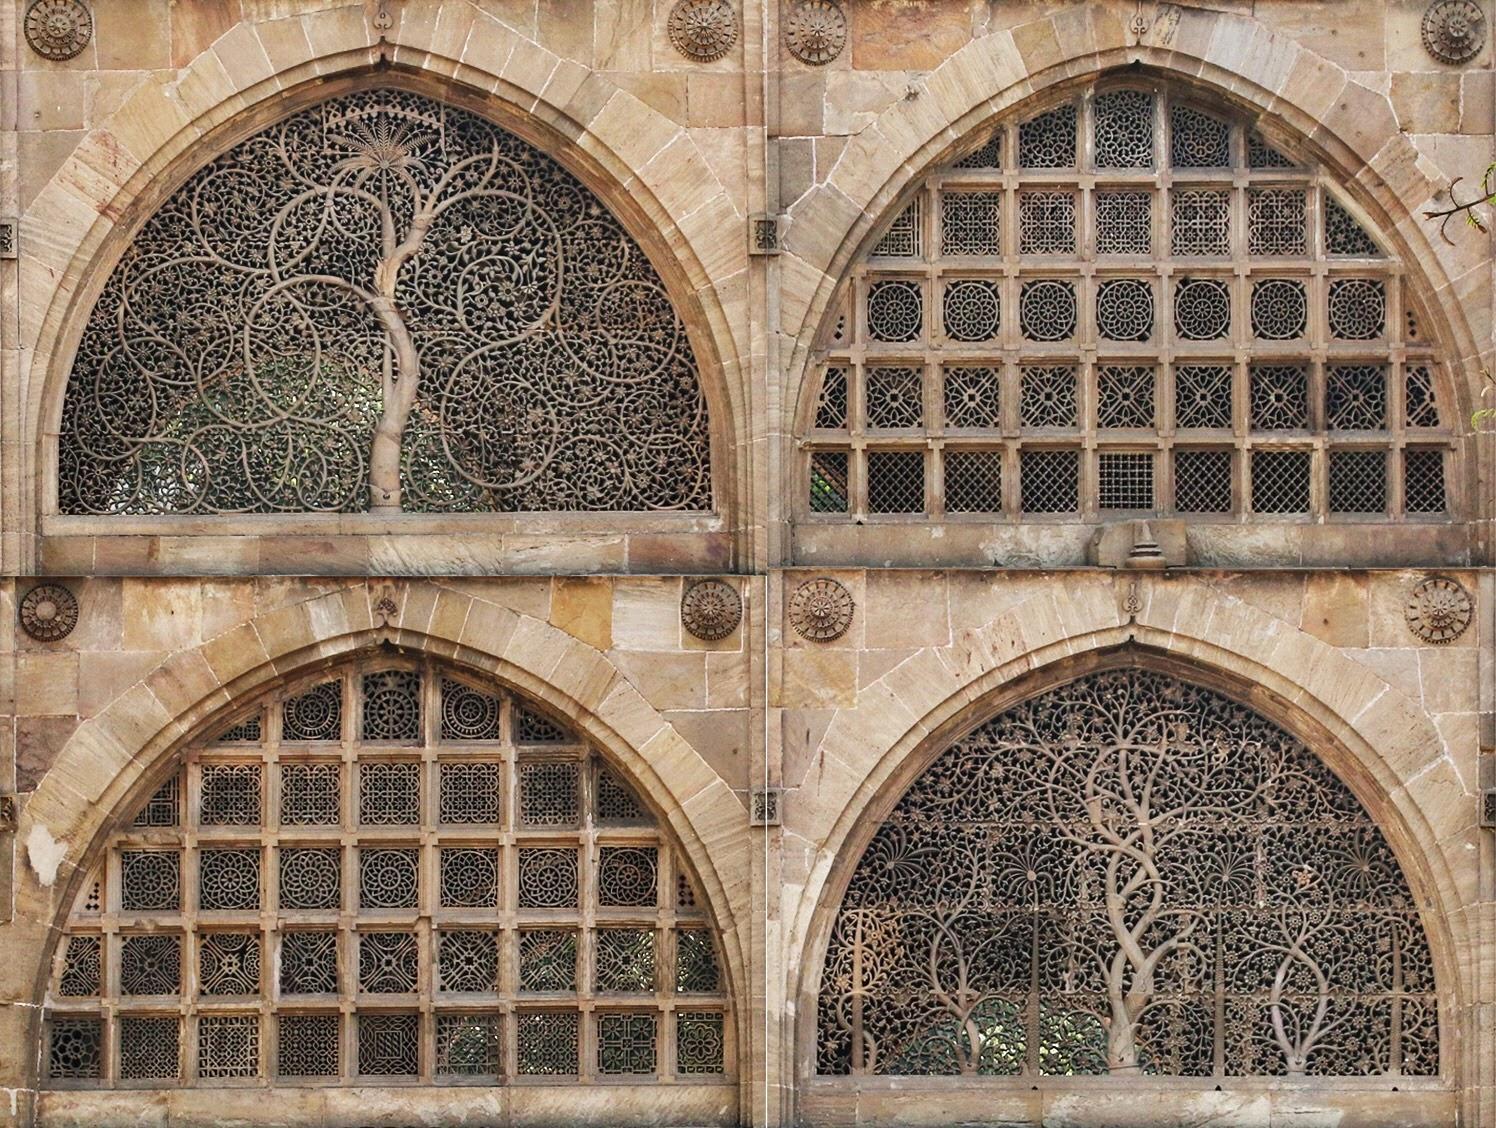 Sidi Saiyyed Mosque Ahmedabad Jali IIM Logo tree of life sayed sayeed masjid islam muslim